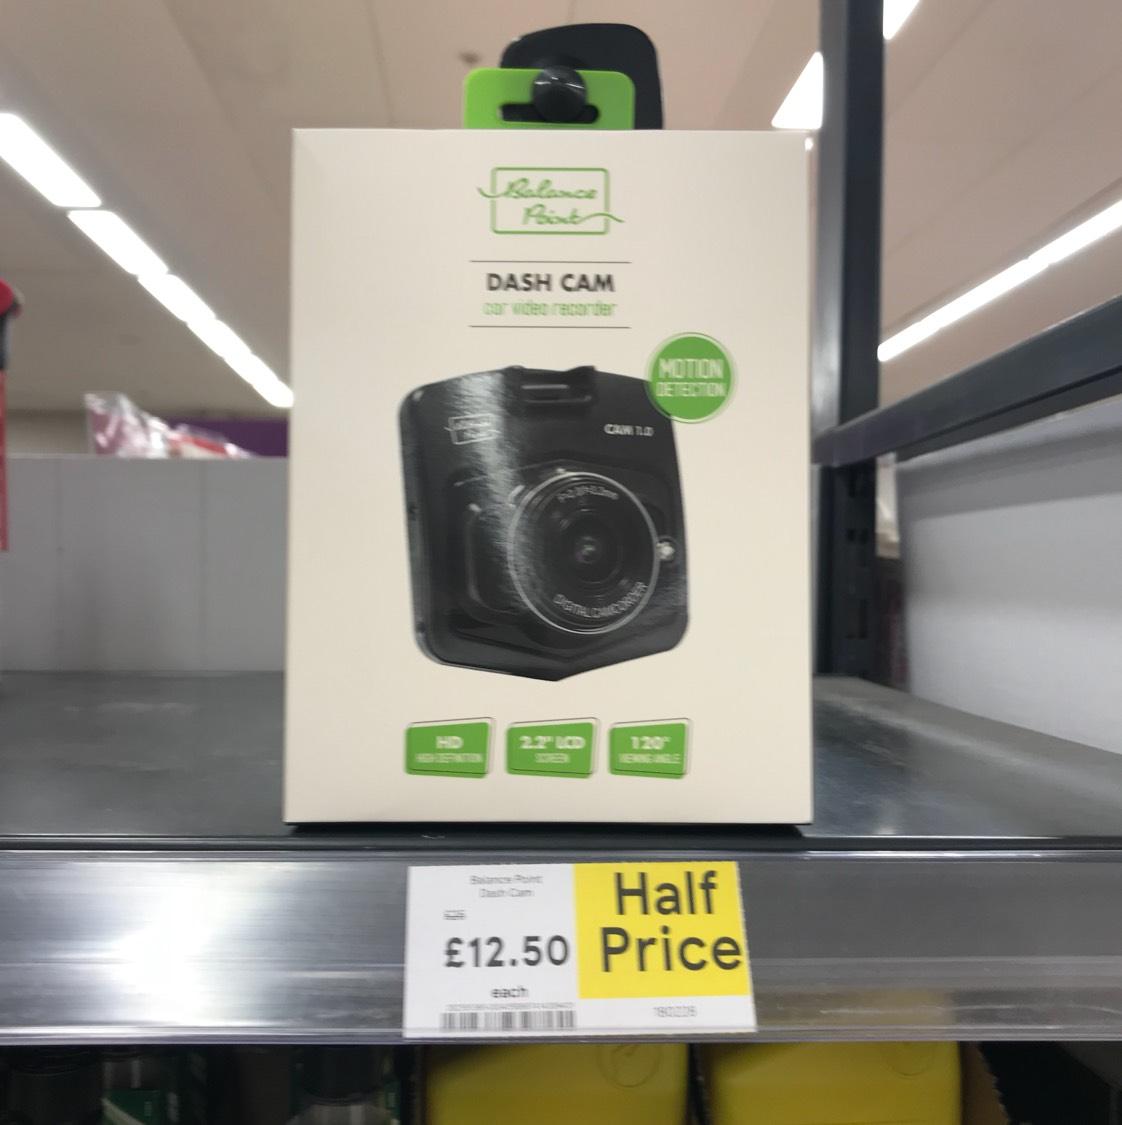 Balance Point Dash cam - £12.50 instore / online @ Tesco Direct